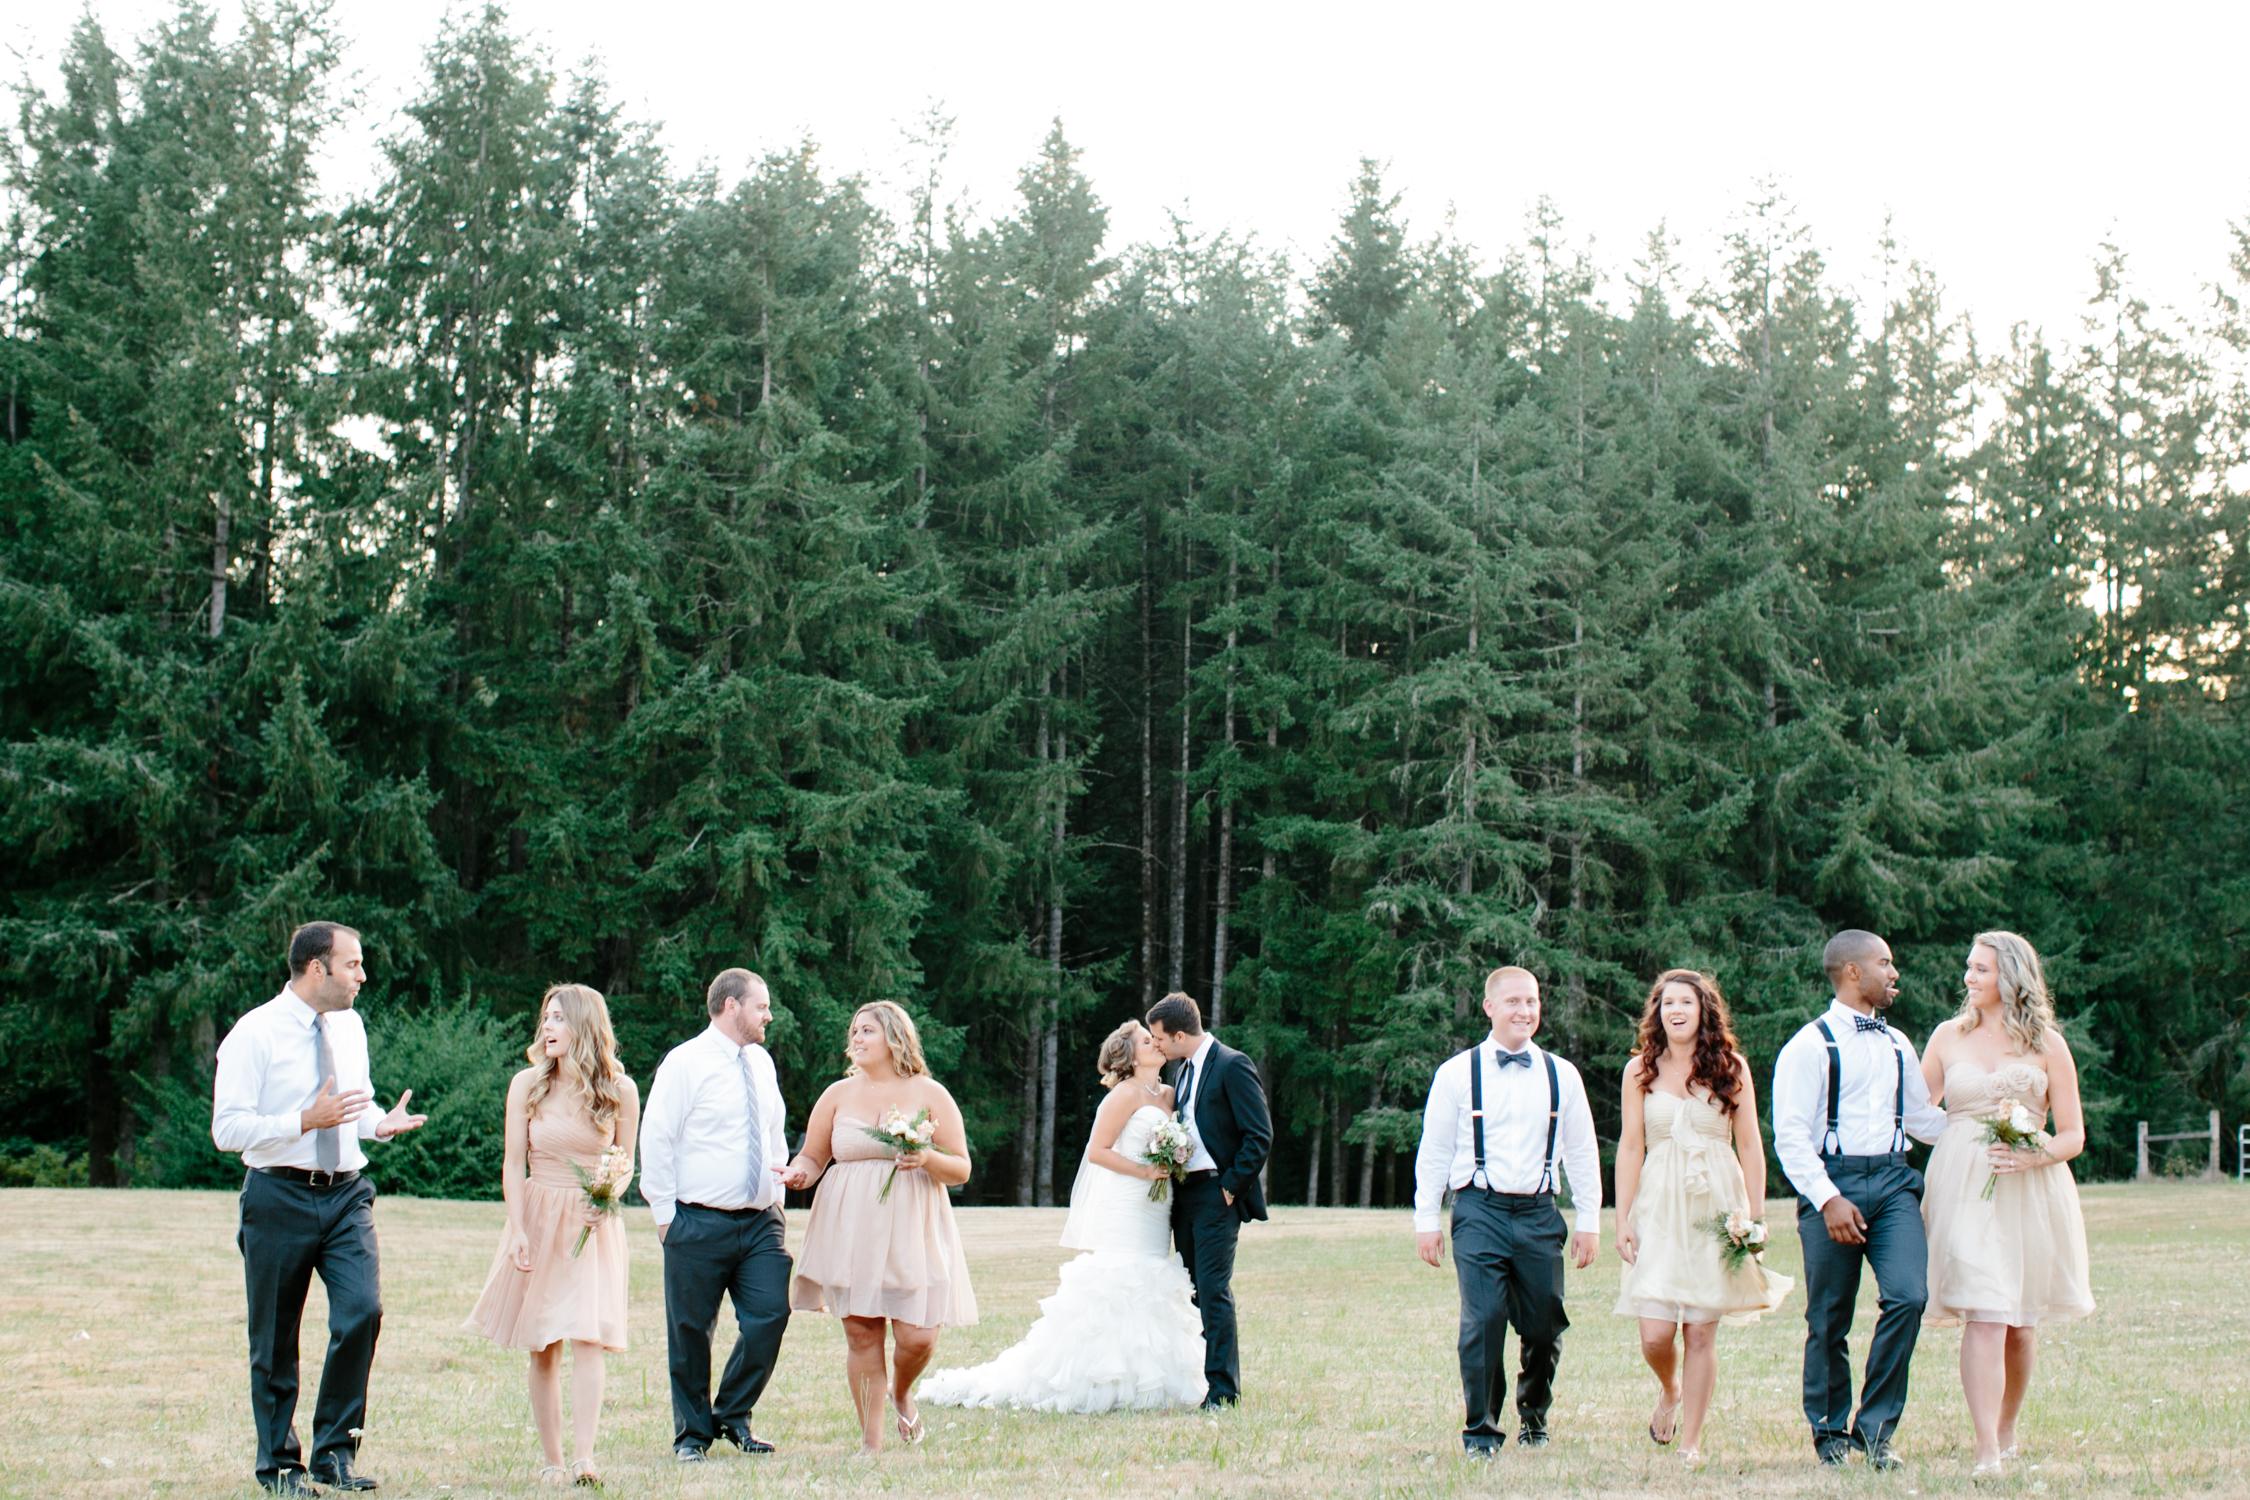 Oregon Barn Wedding by Michelle Cross-20.jpg